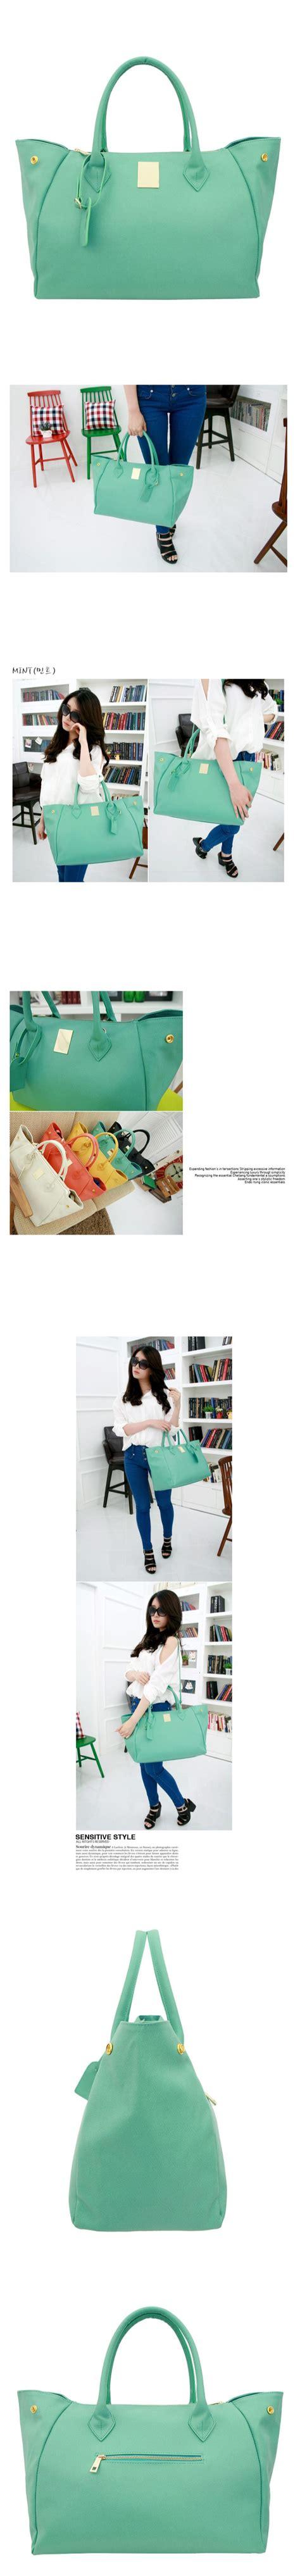 Cache Http Iektzy Ipnodns Ru Ui Developer Resume Pdf Html Bag Handbag Shoulder Tote Hobo Black Brown Designer